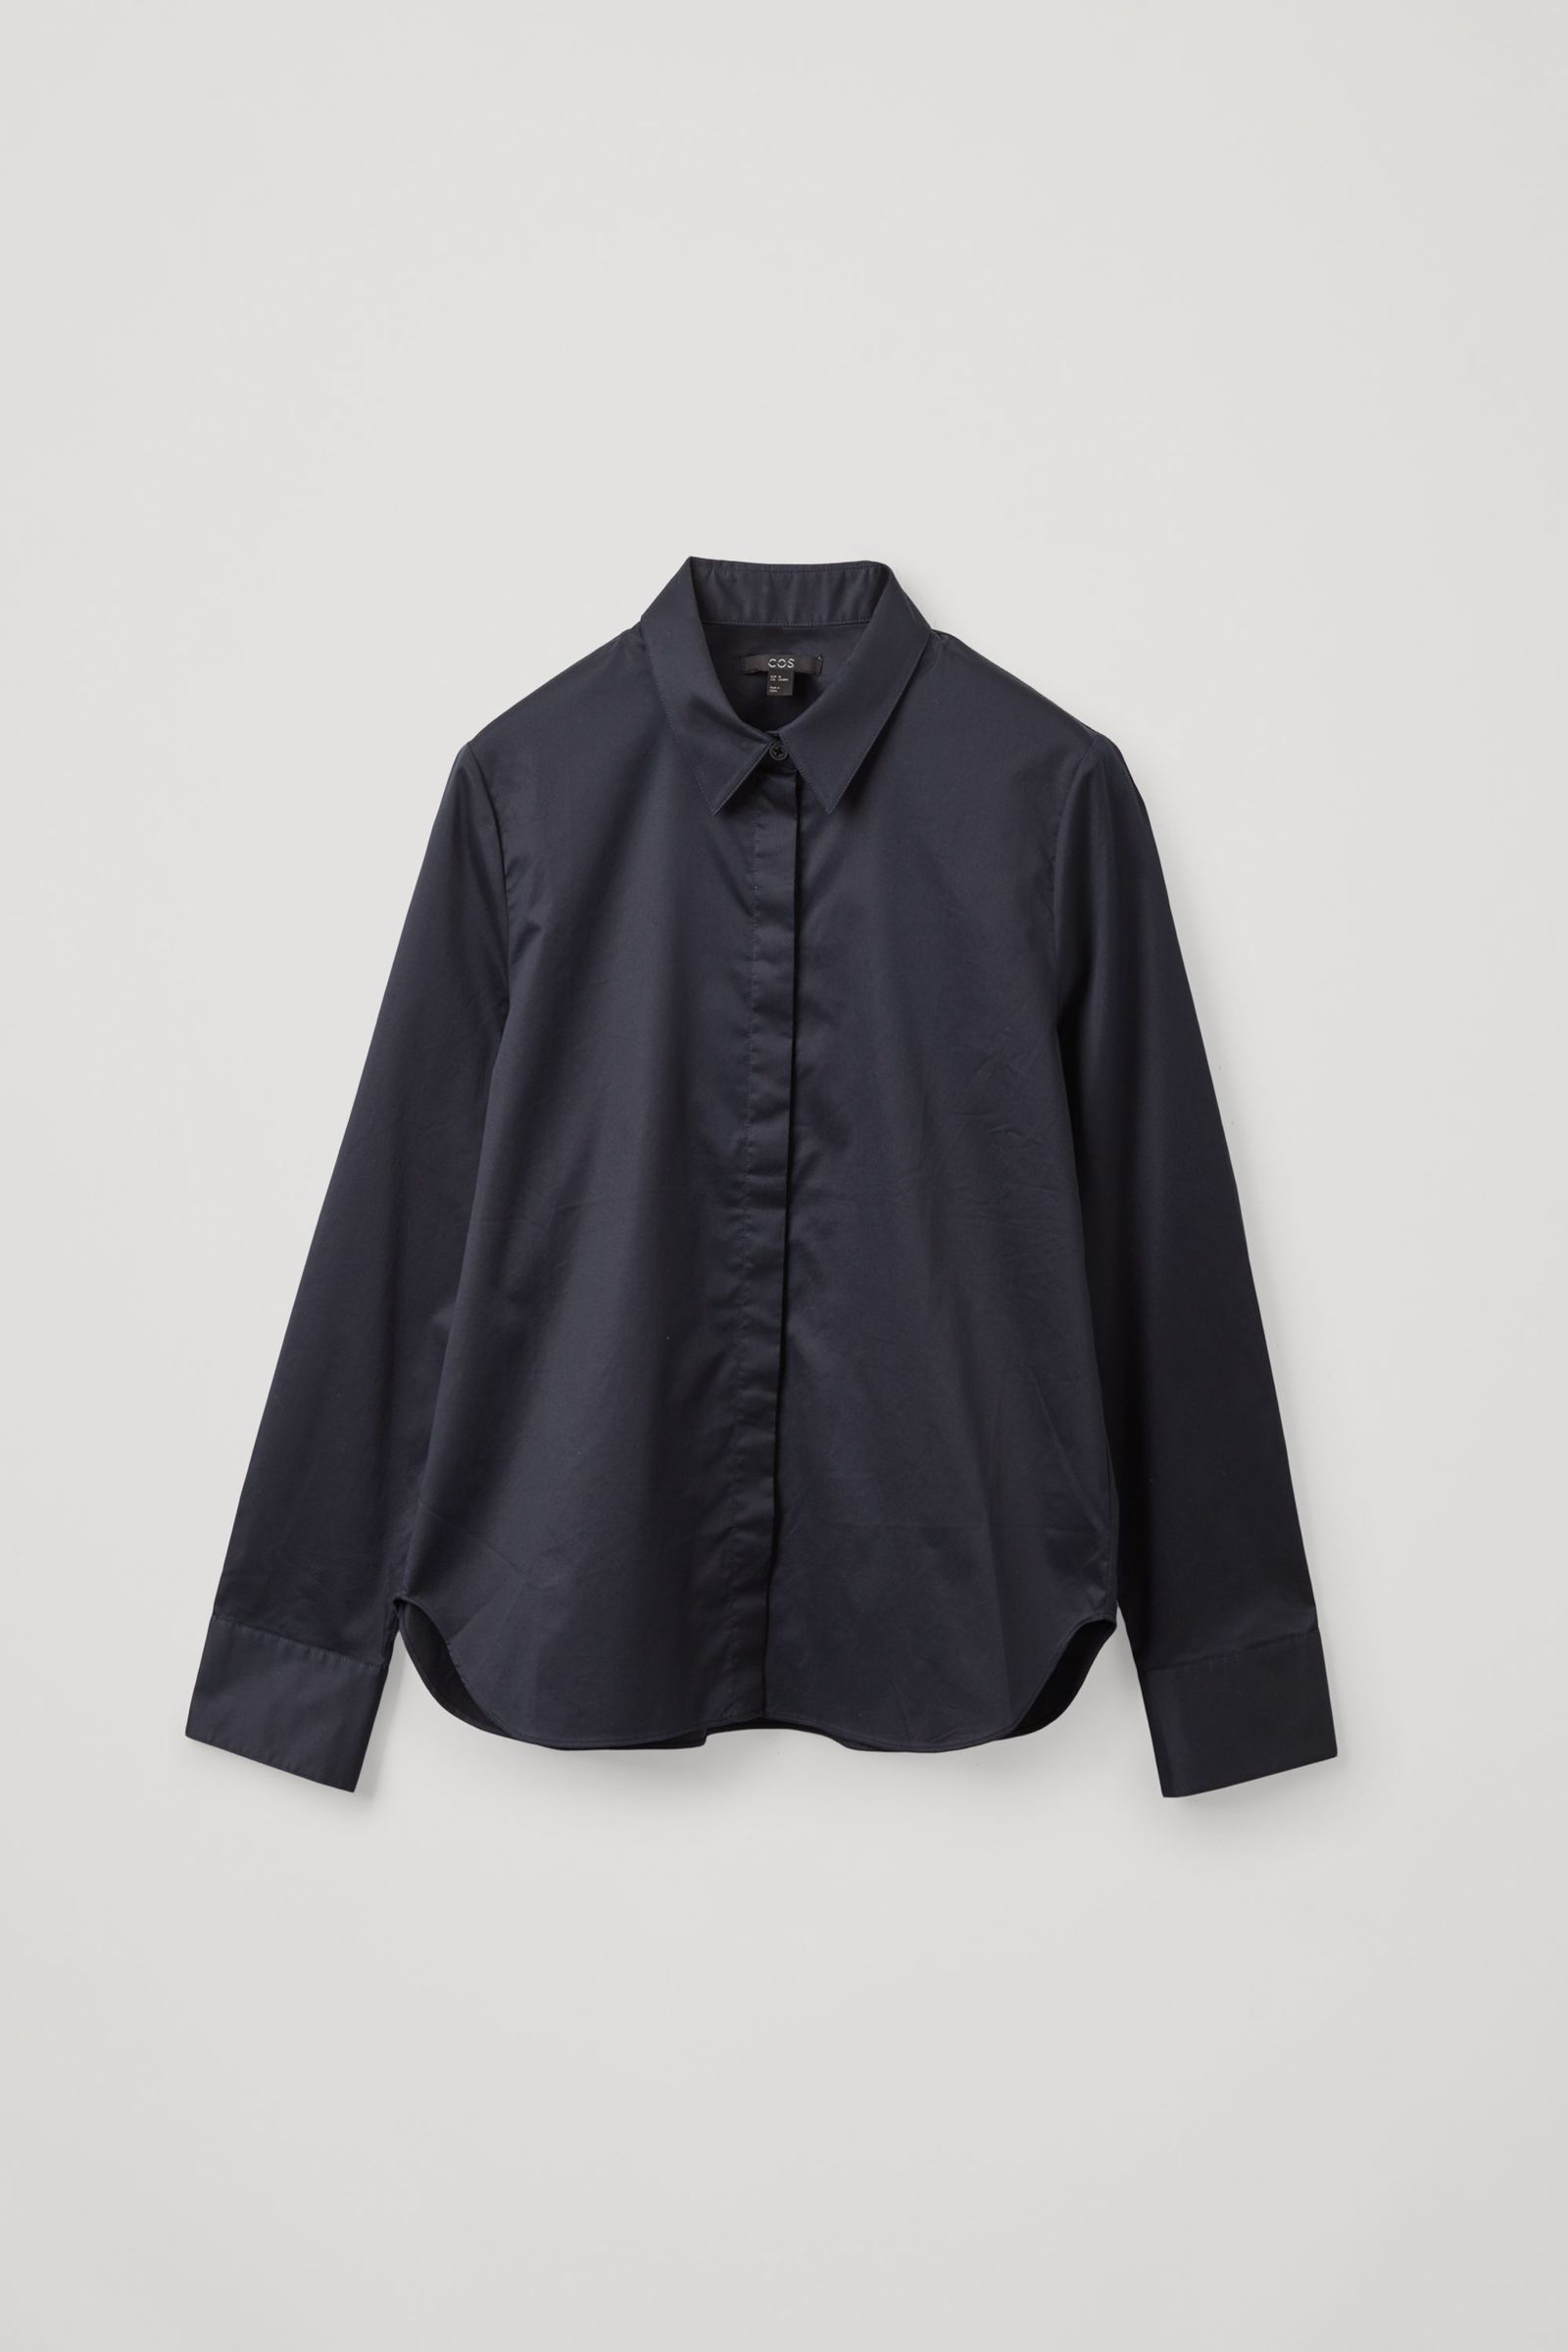 COS 코튼 슬림 핏 셔츠의 블루컬러 Product입니다.